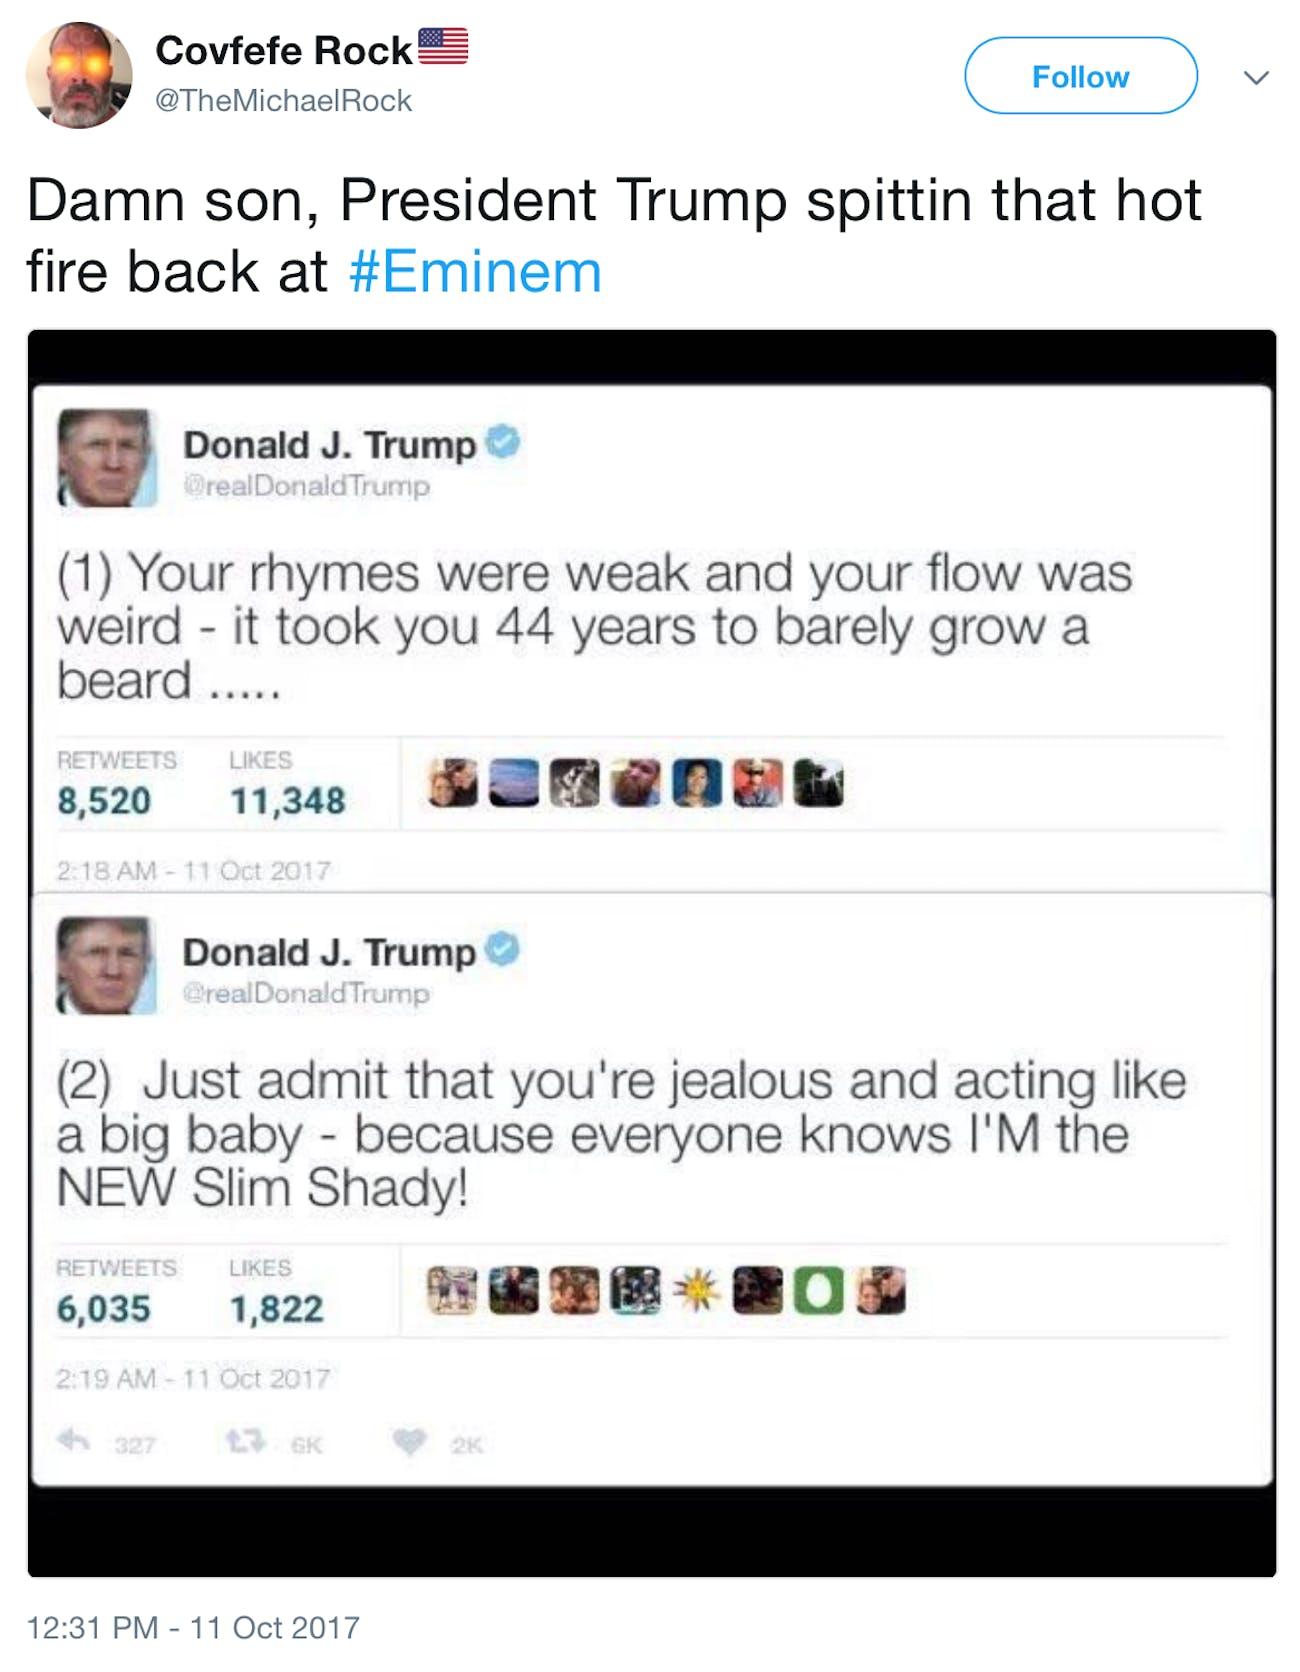 Trump's possible response.